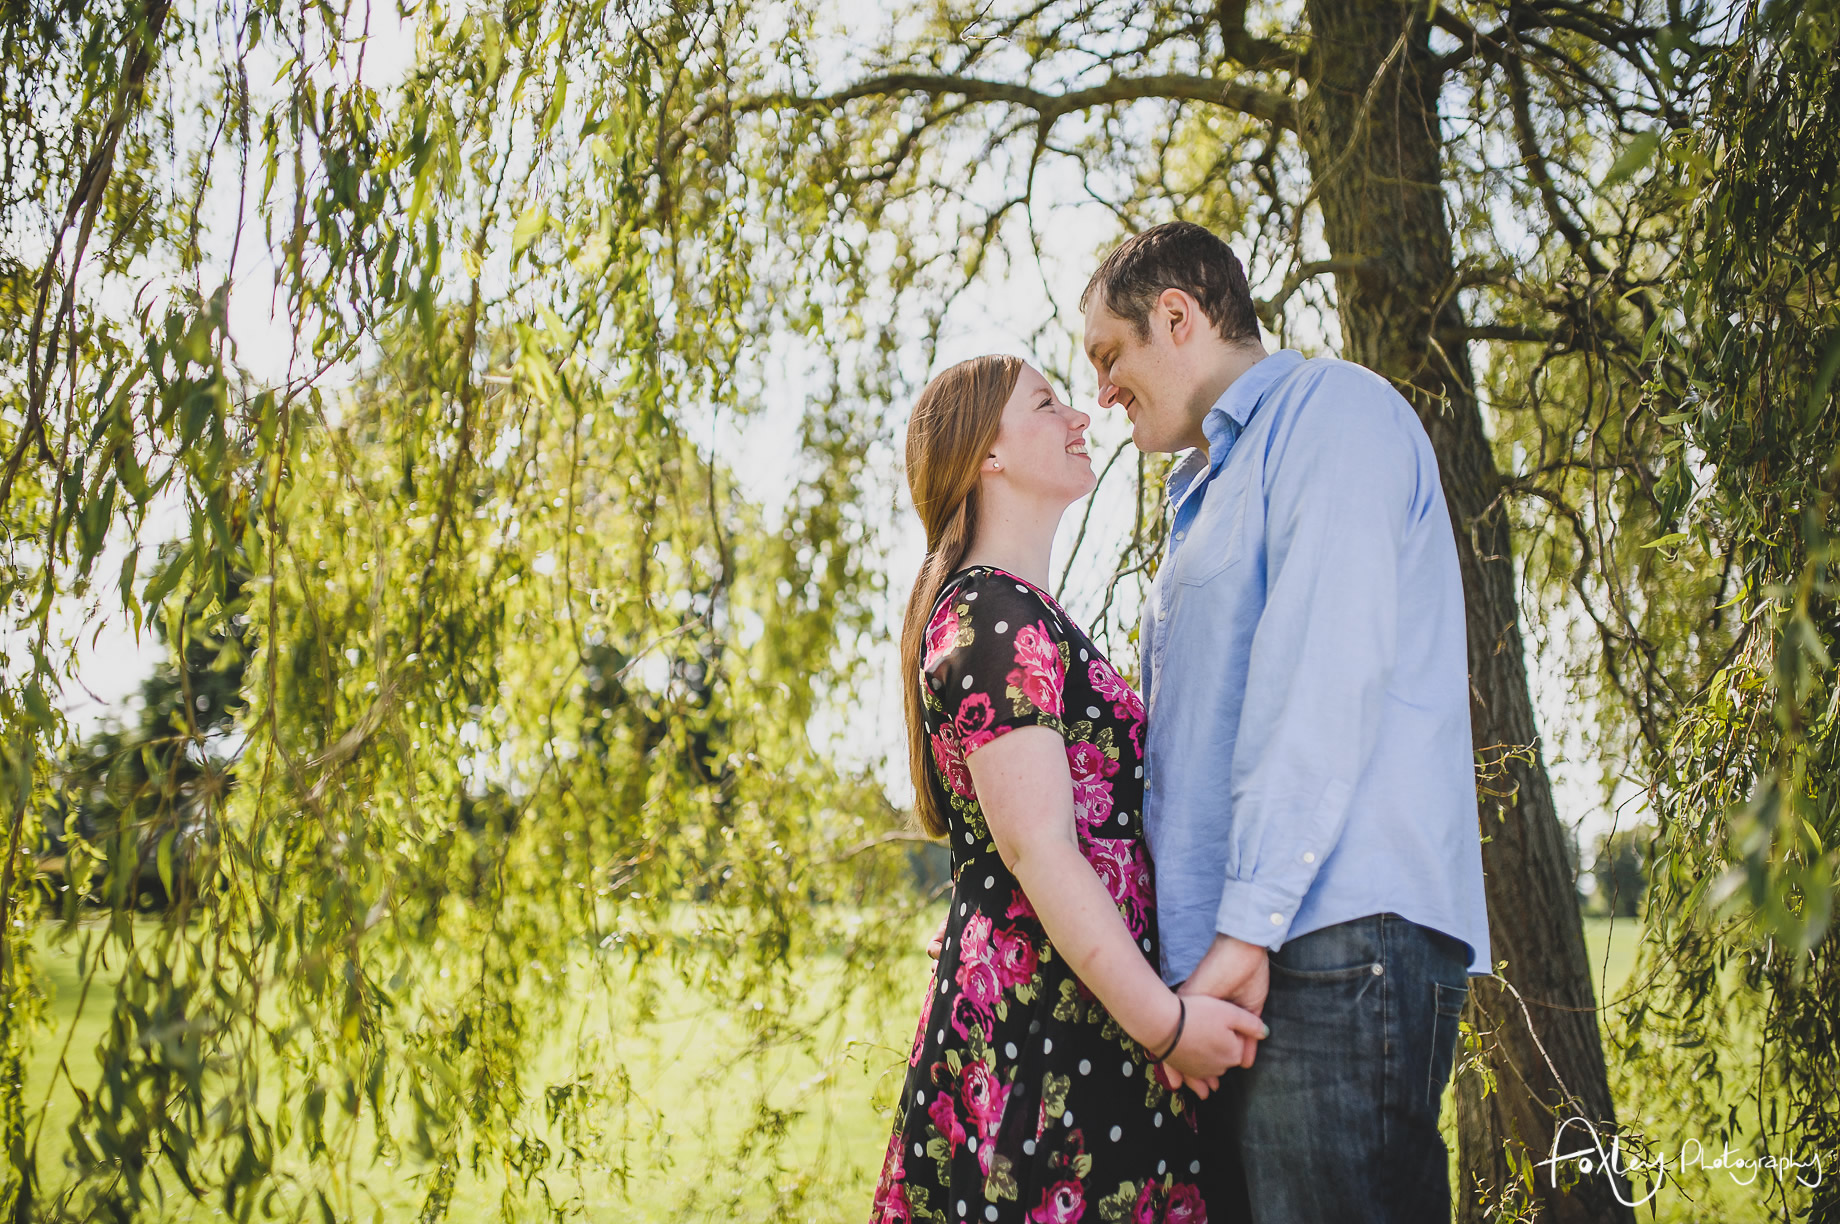 Faye and Doug Pre-Wedding Shoot at Haslam Park 011